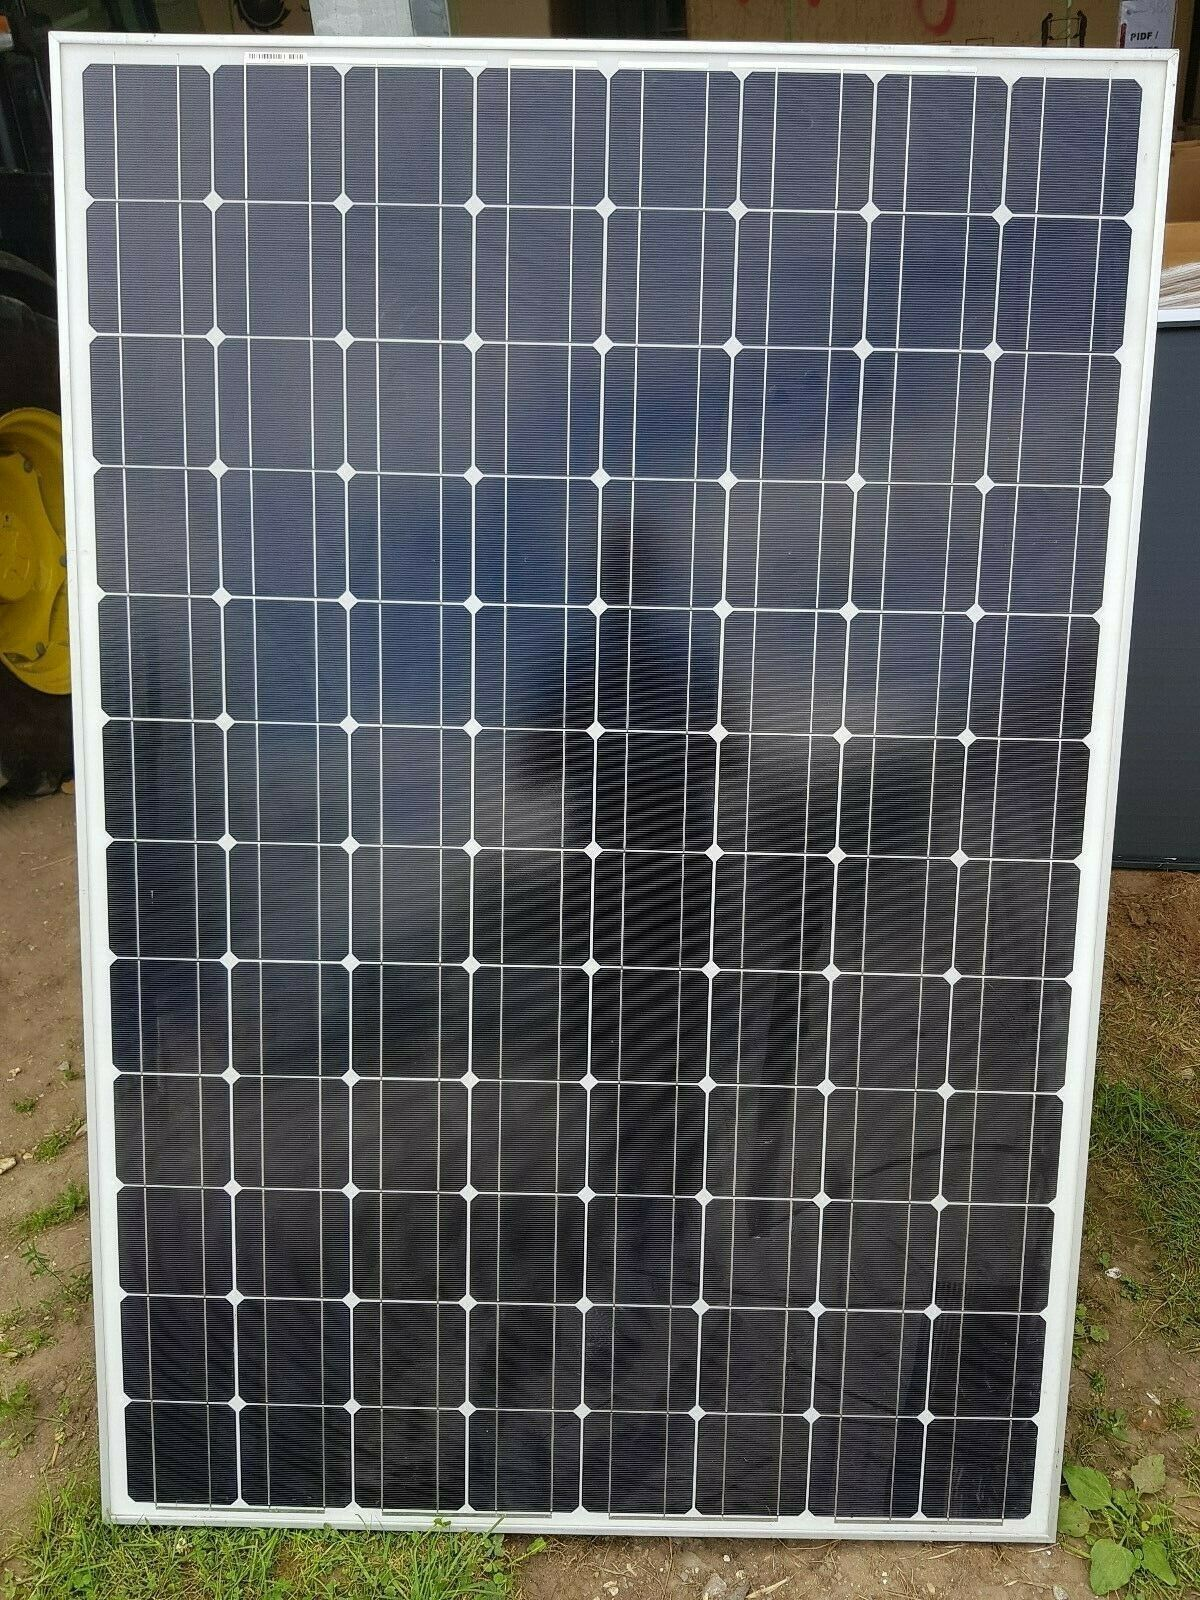 4kw Solar Panel In 2020 Solar Panels Solar Paneling